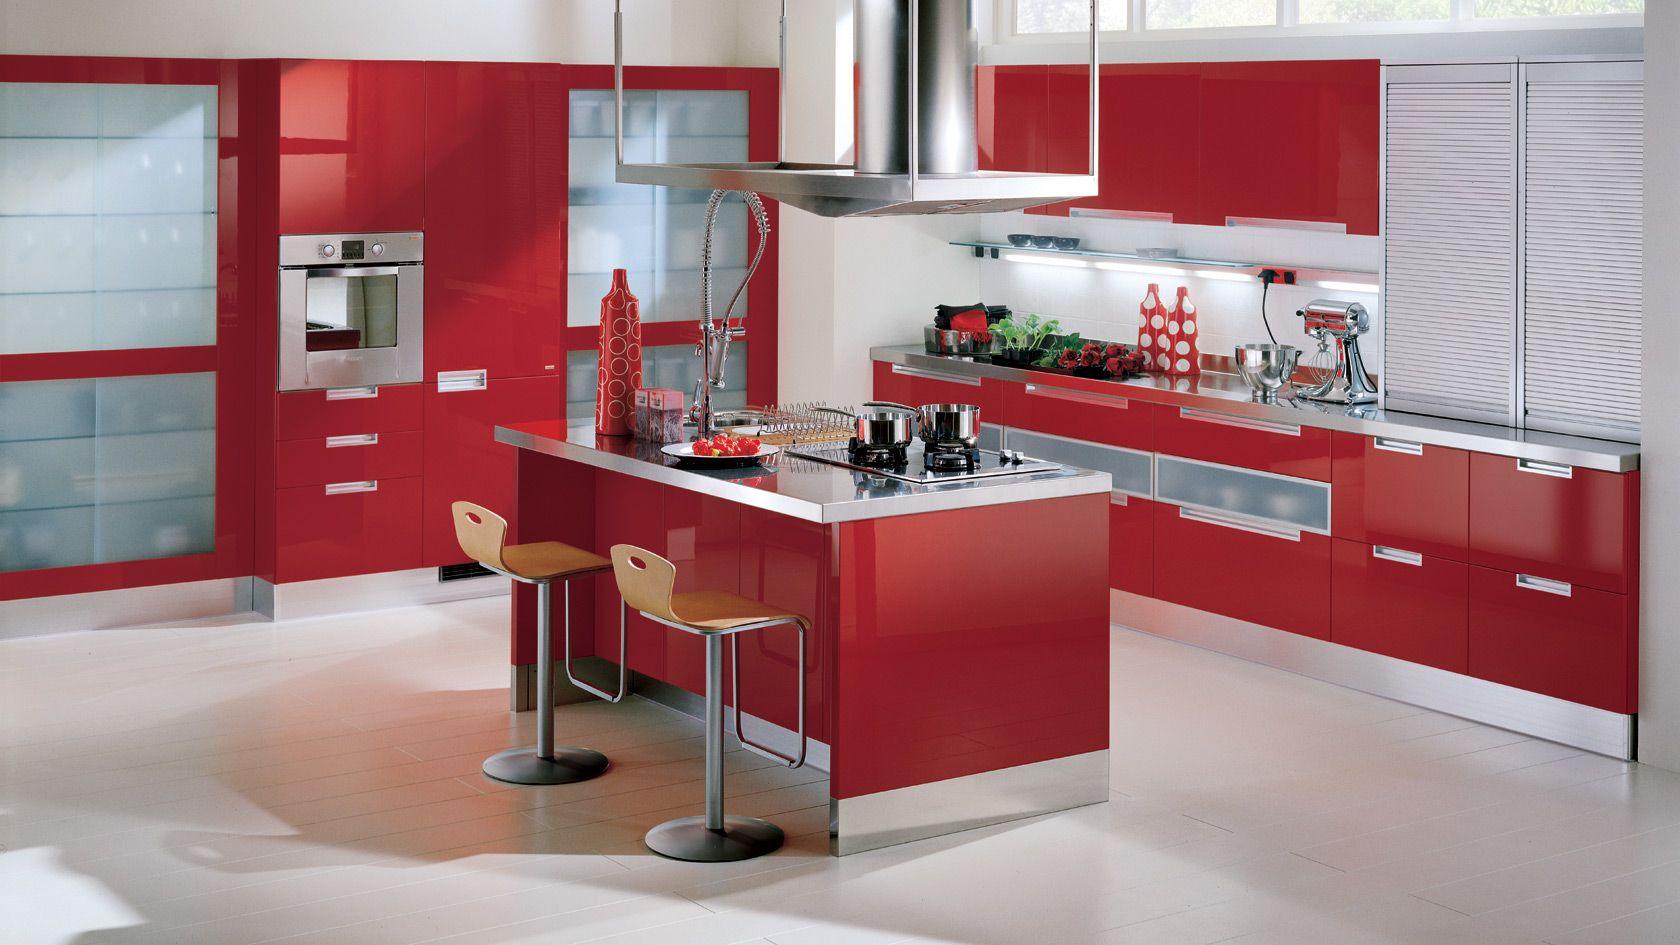 Cucina City Scavolini | Ketchen | Pinterest | Kitchens, Luxury ...